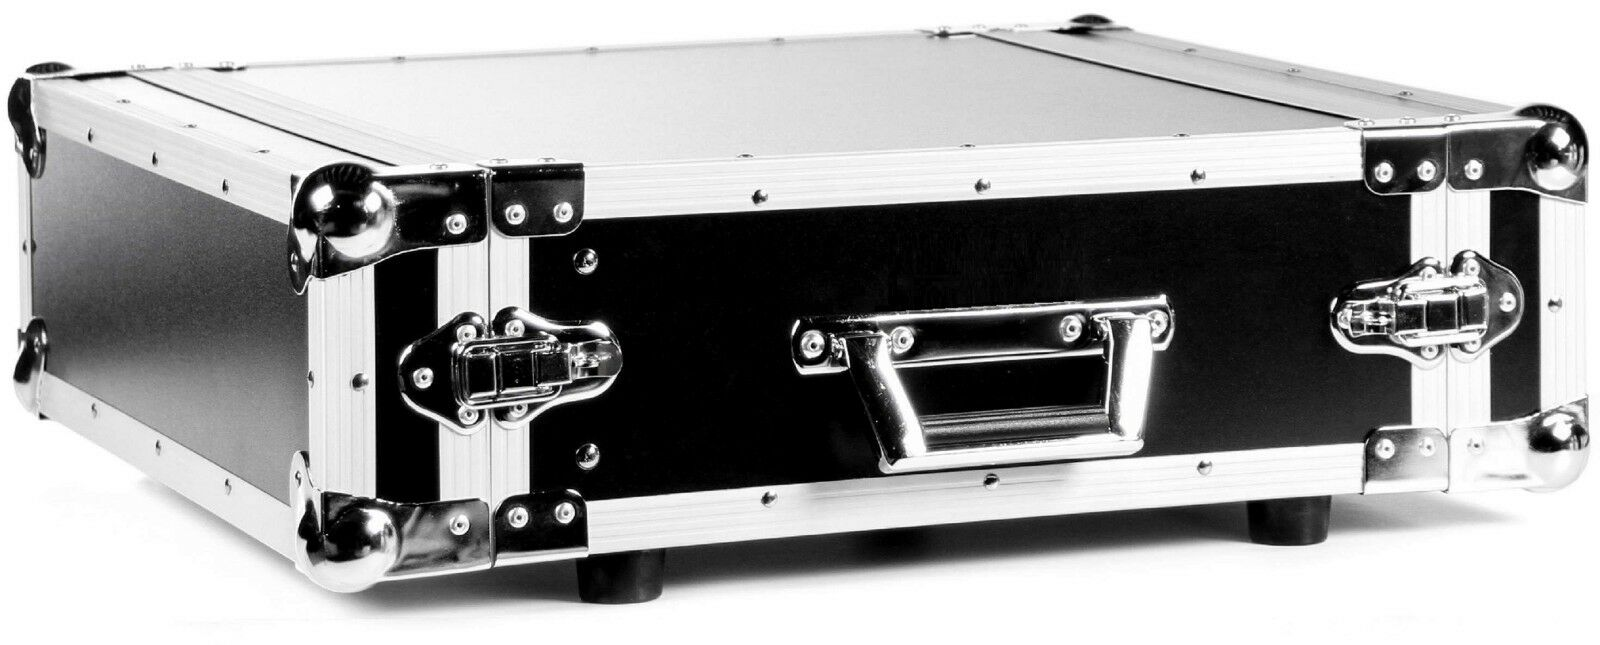 TEGO PRO 3 HE Rack Effektrack, 43 cm tief 19  CO DD schwarz, Amprack DJ-Rack